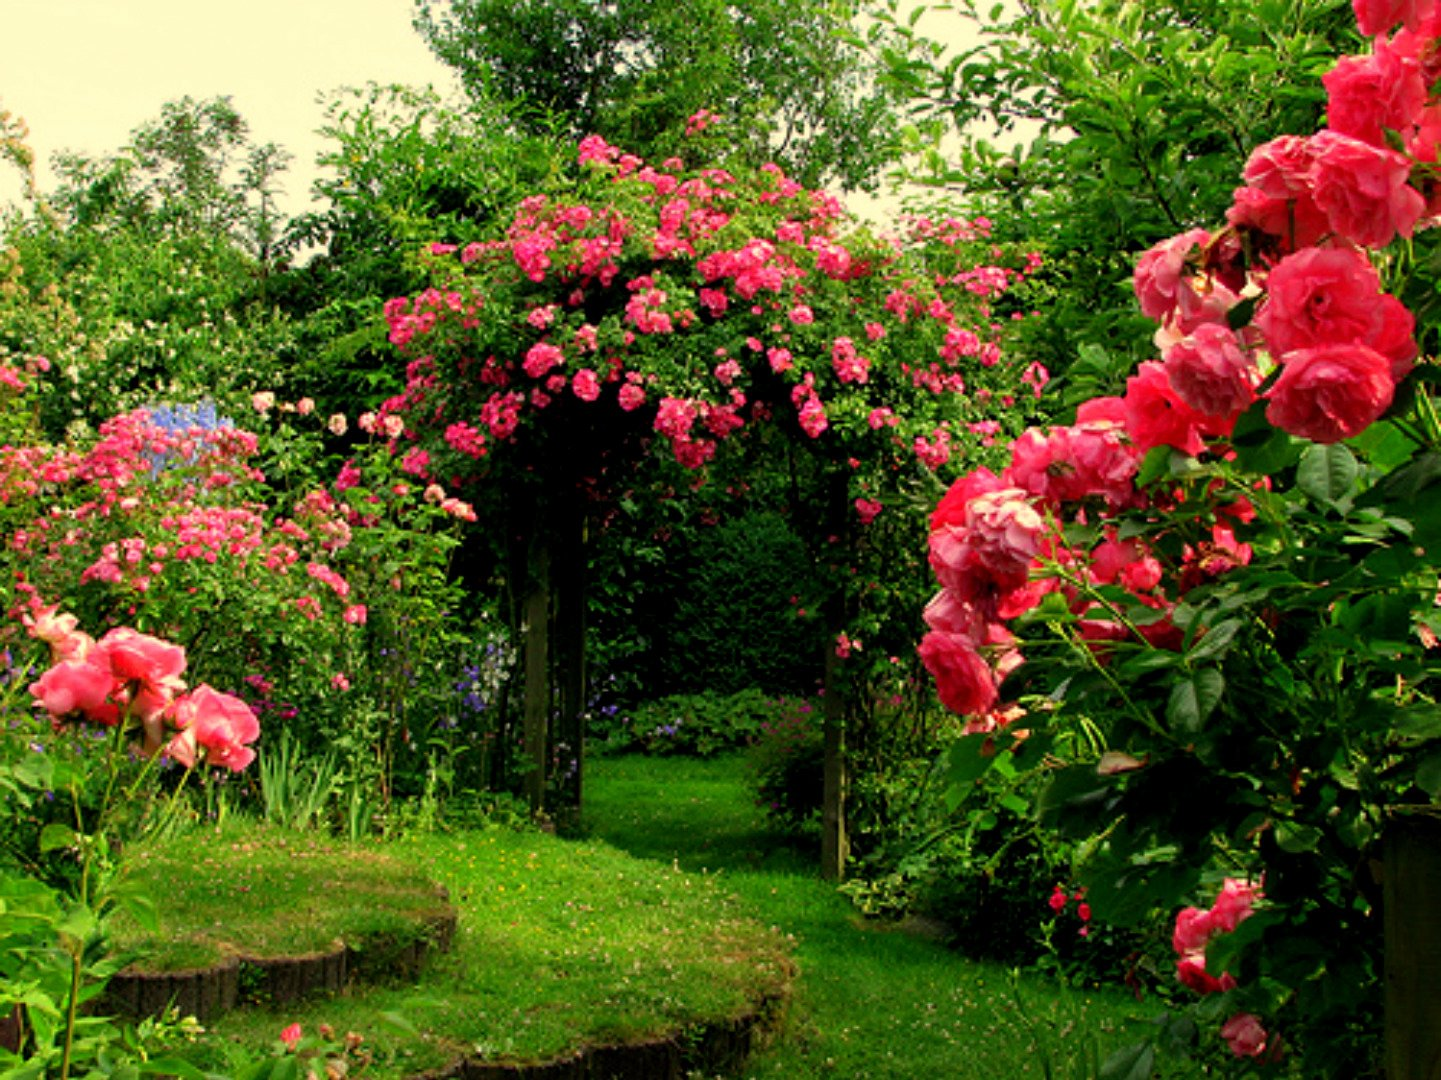 42 Rose Garden Wallpaper Desktops On Wallpapersafari